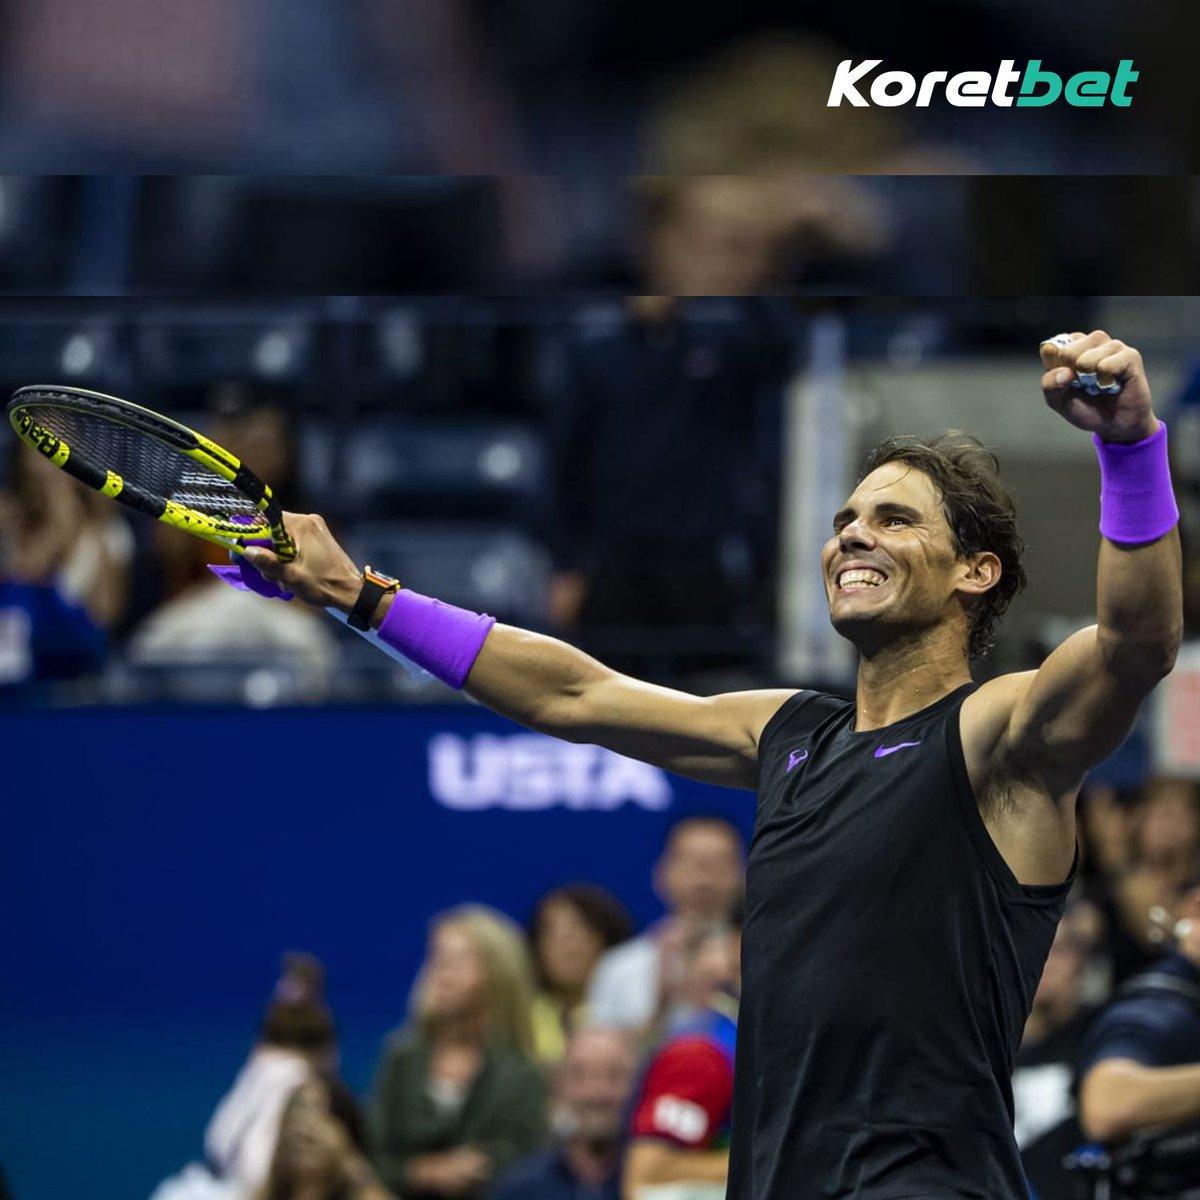 test Twitter Media - Introducing men's player of the season, Rafael Nadal! He's one title away from matching Federer atop the men's grand slam ladder with 20. Where does he rank among the greats?  #Tennis #Nadal #Federer #Djokovic #FrenchOpen #USOpen #Koretbet https://t.co/l7OvTUtEK5